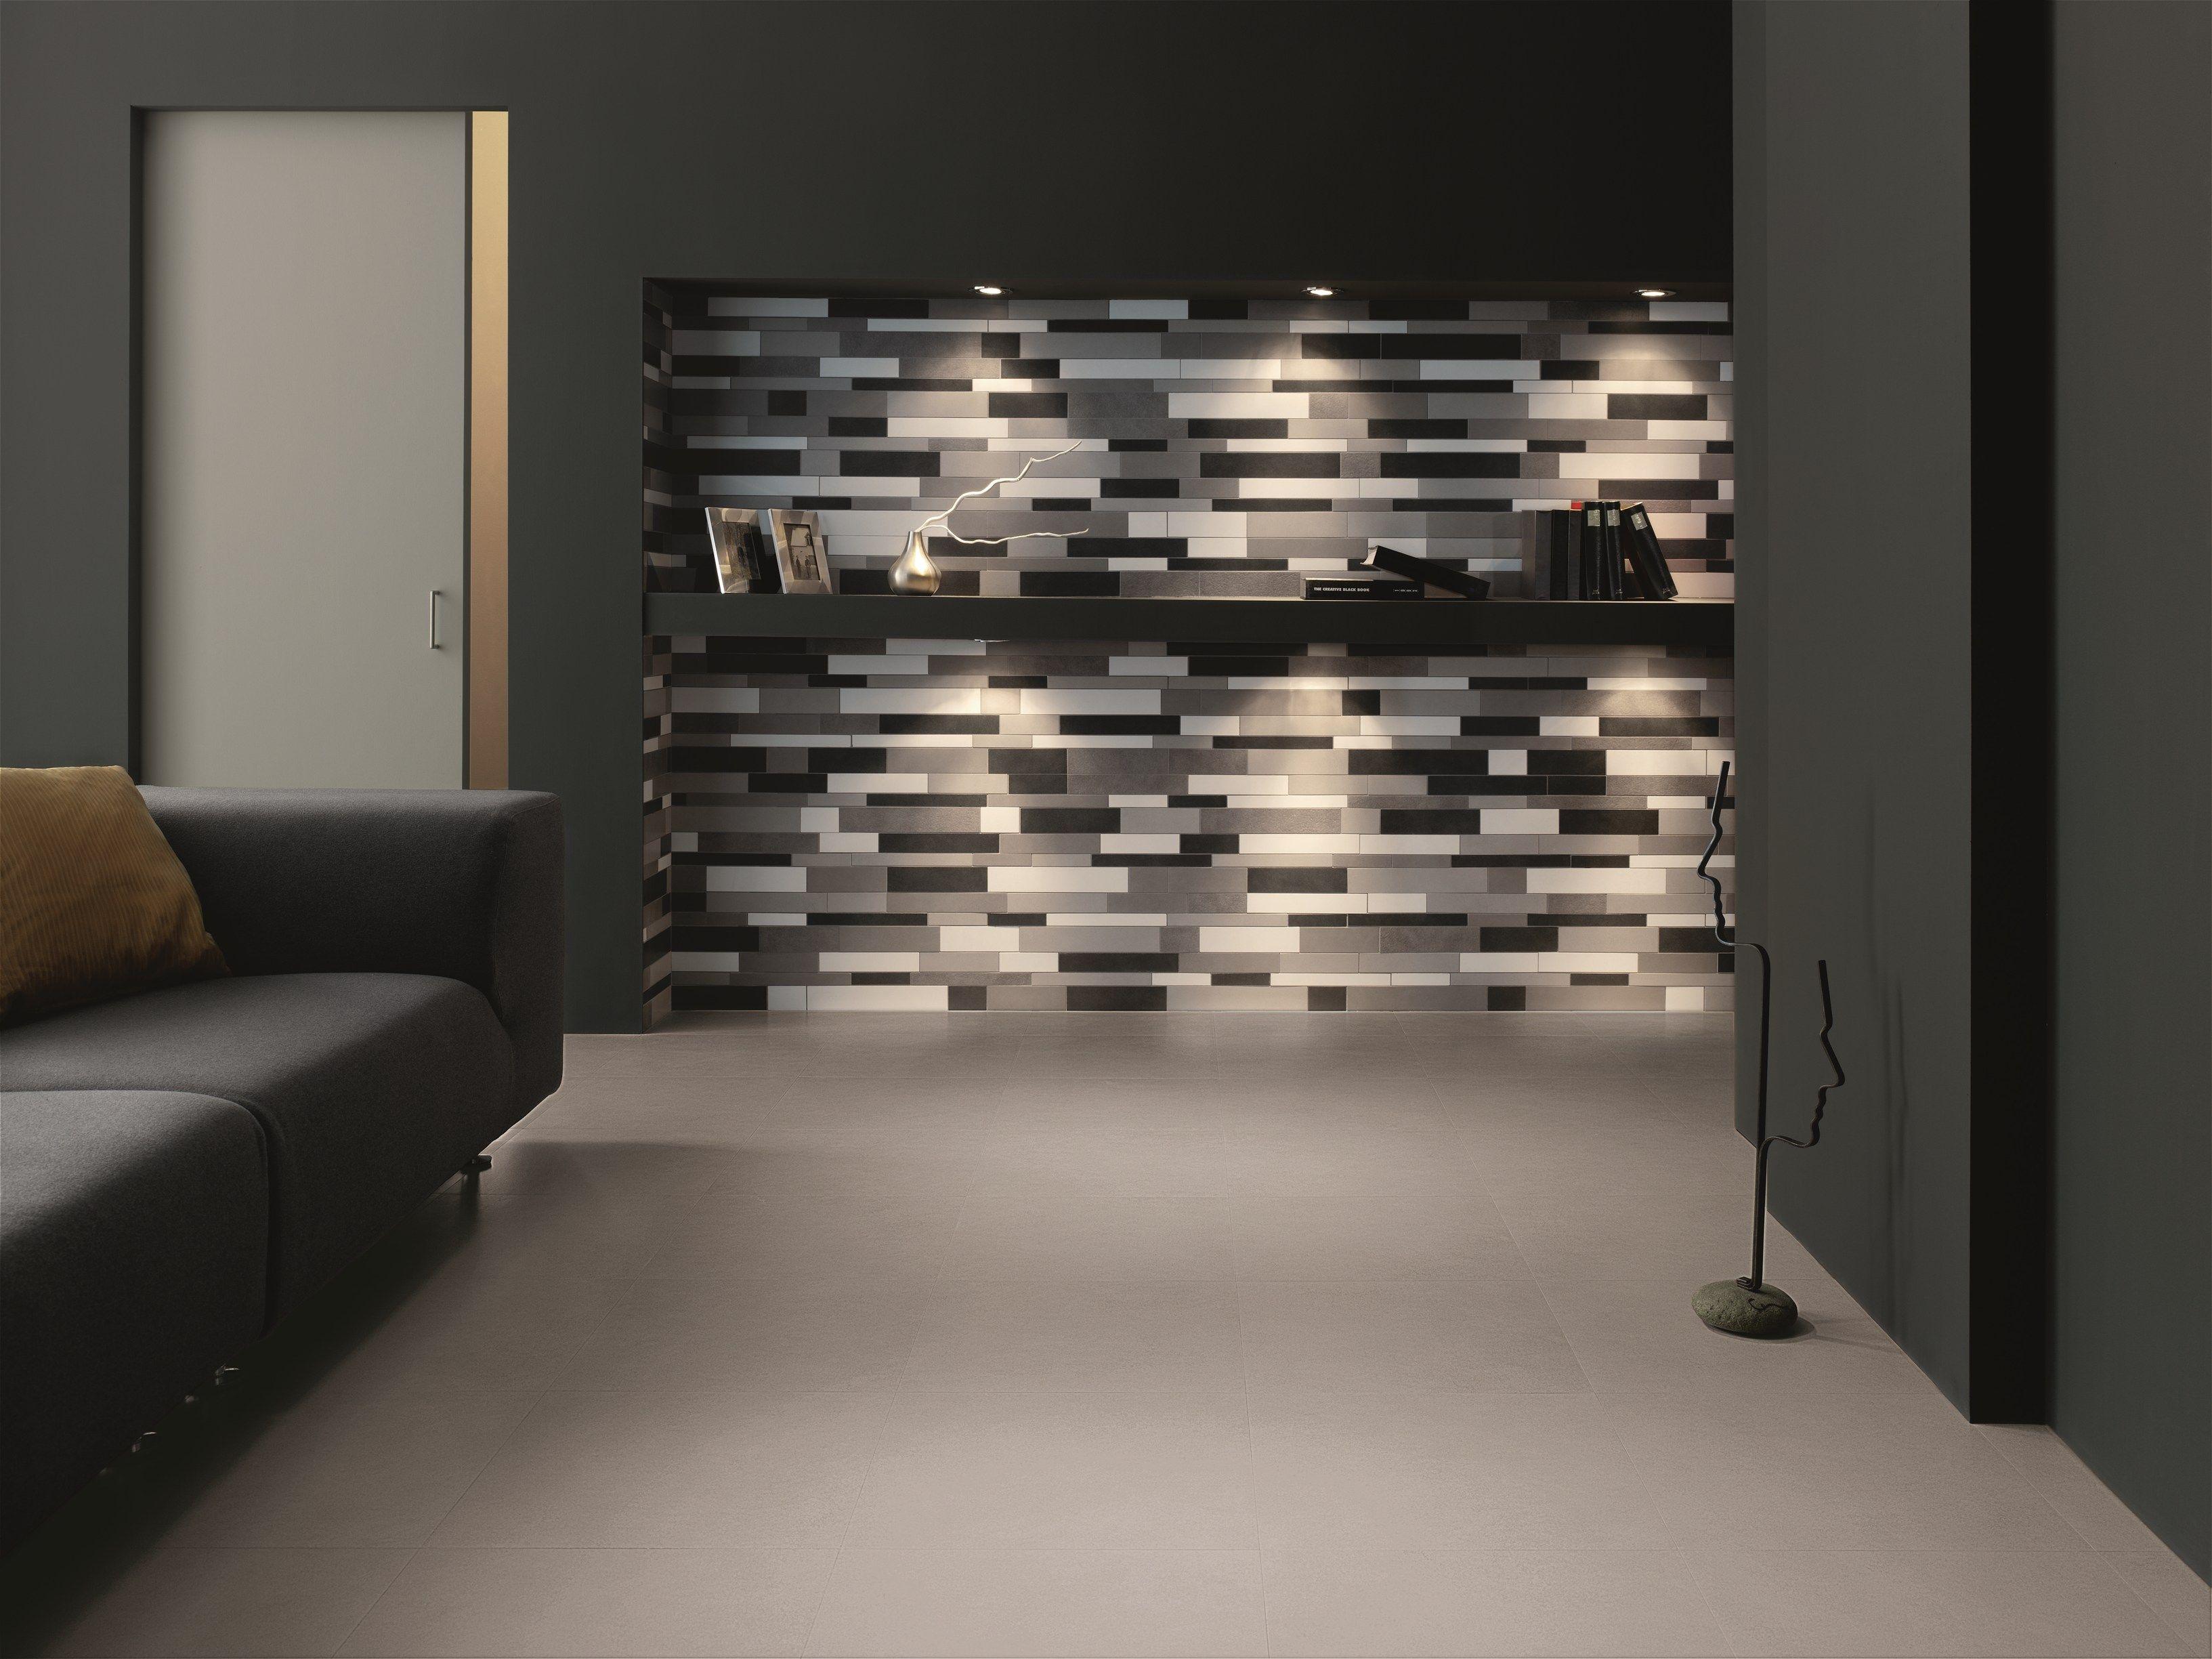 Porcelain stoneware wall floor tiles visual visual - Carrelage au mur ...